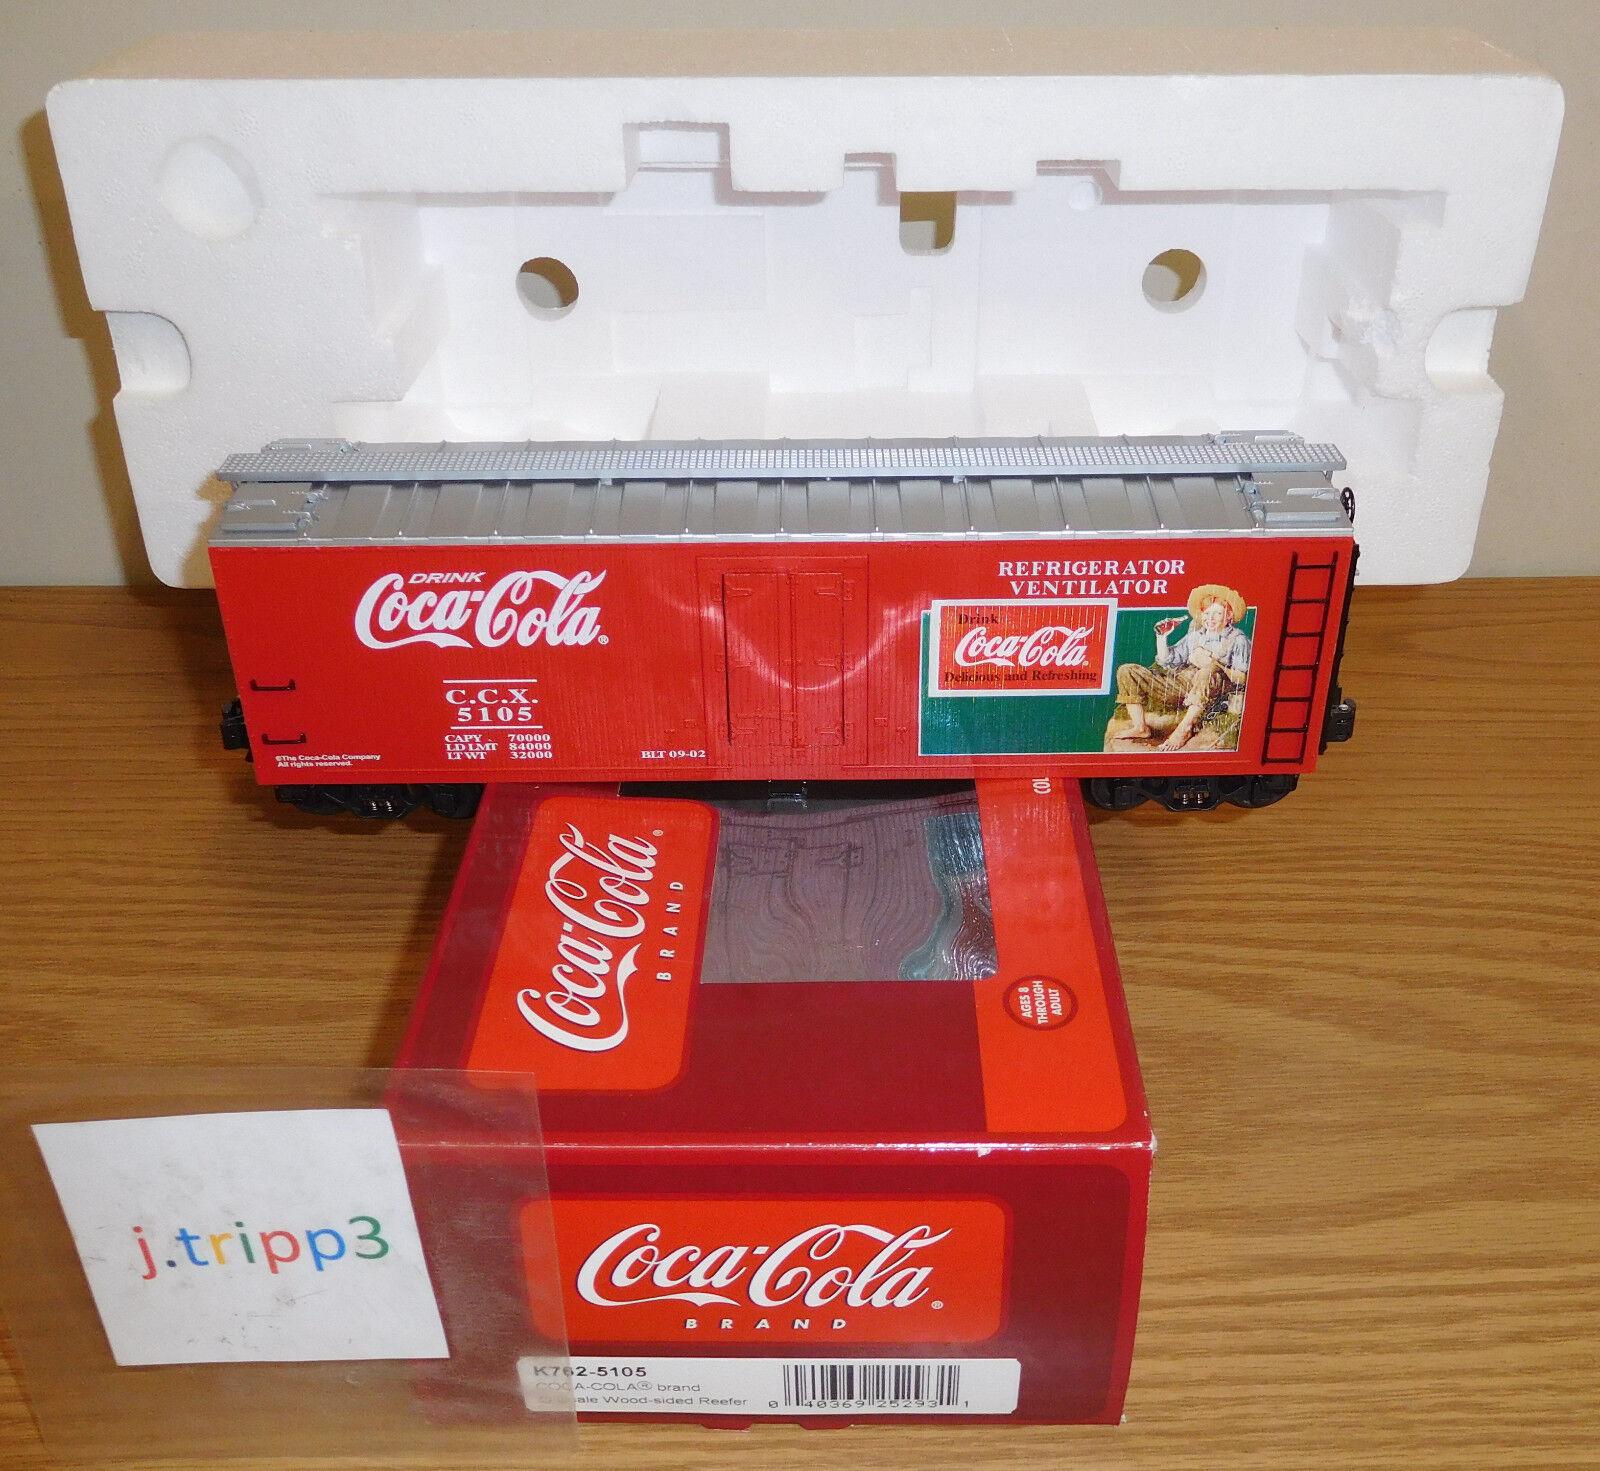 K-LINE K762-5105 COCA-COLA DRINK COKE SODA WOOD-SIDED REEFER CAR O SCALE TRAIN